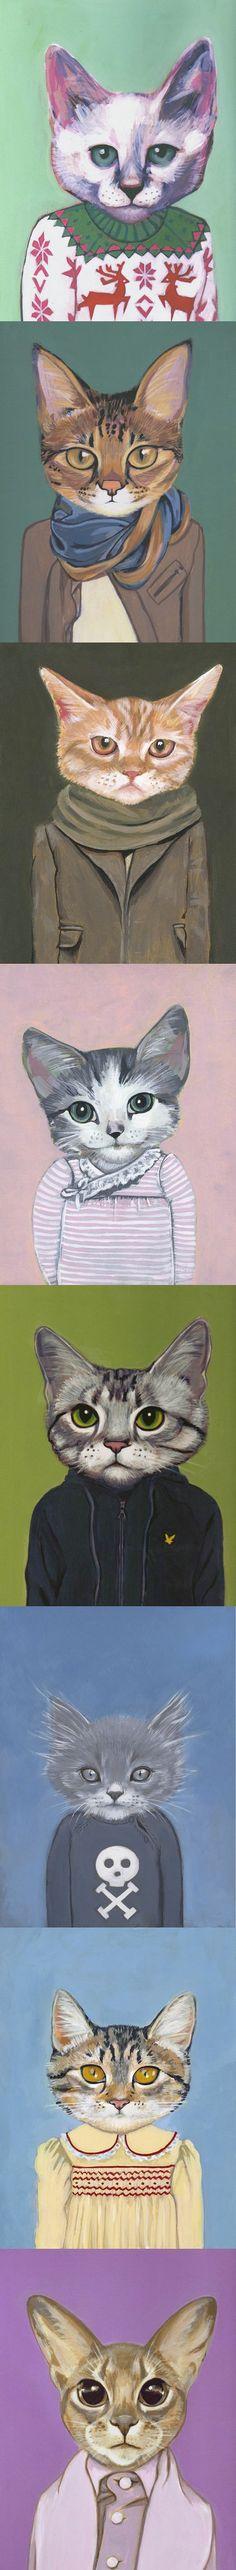 Heather Mattoon. Cats.